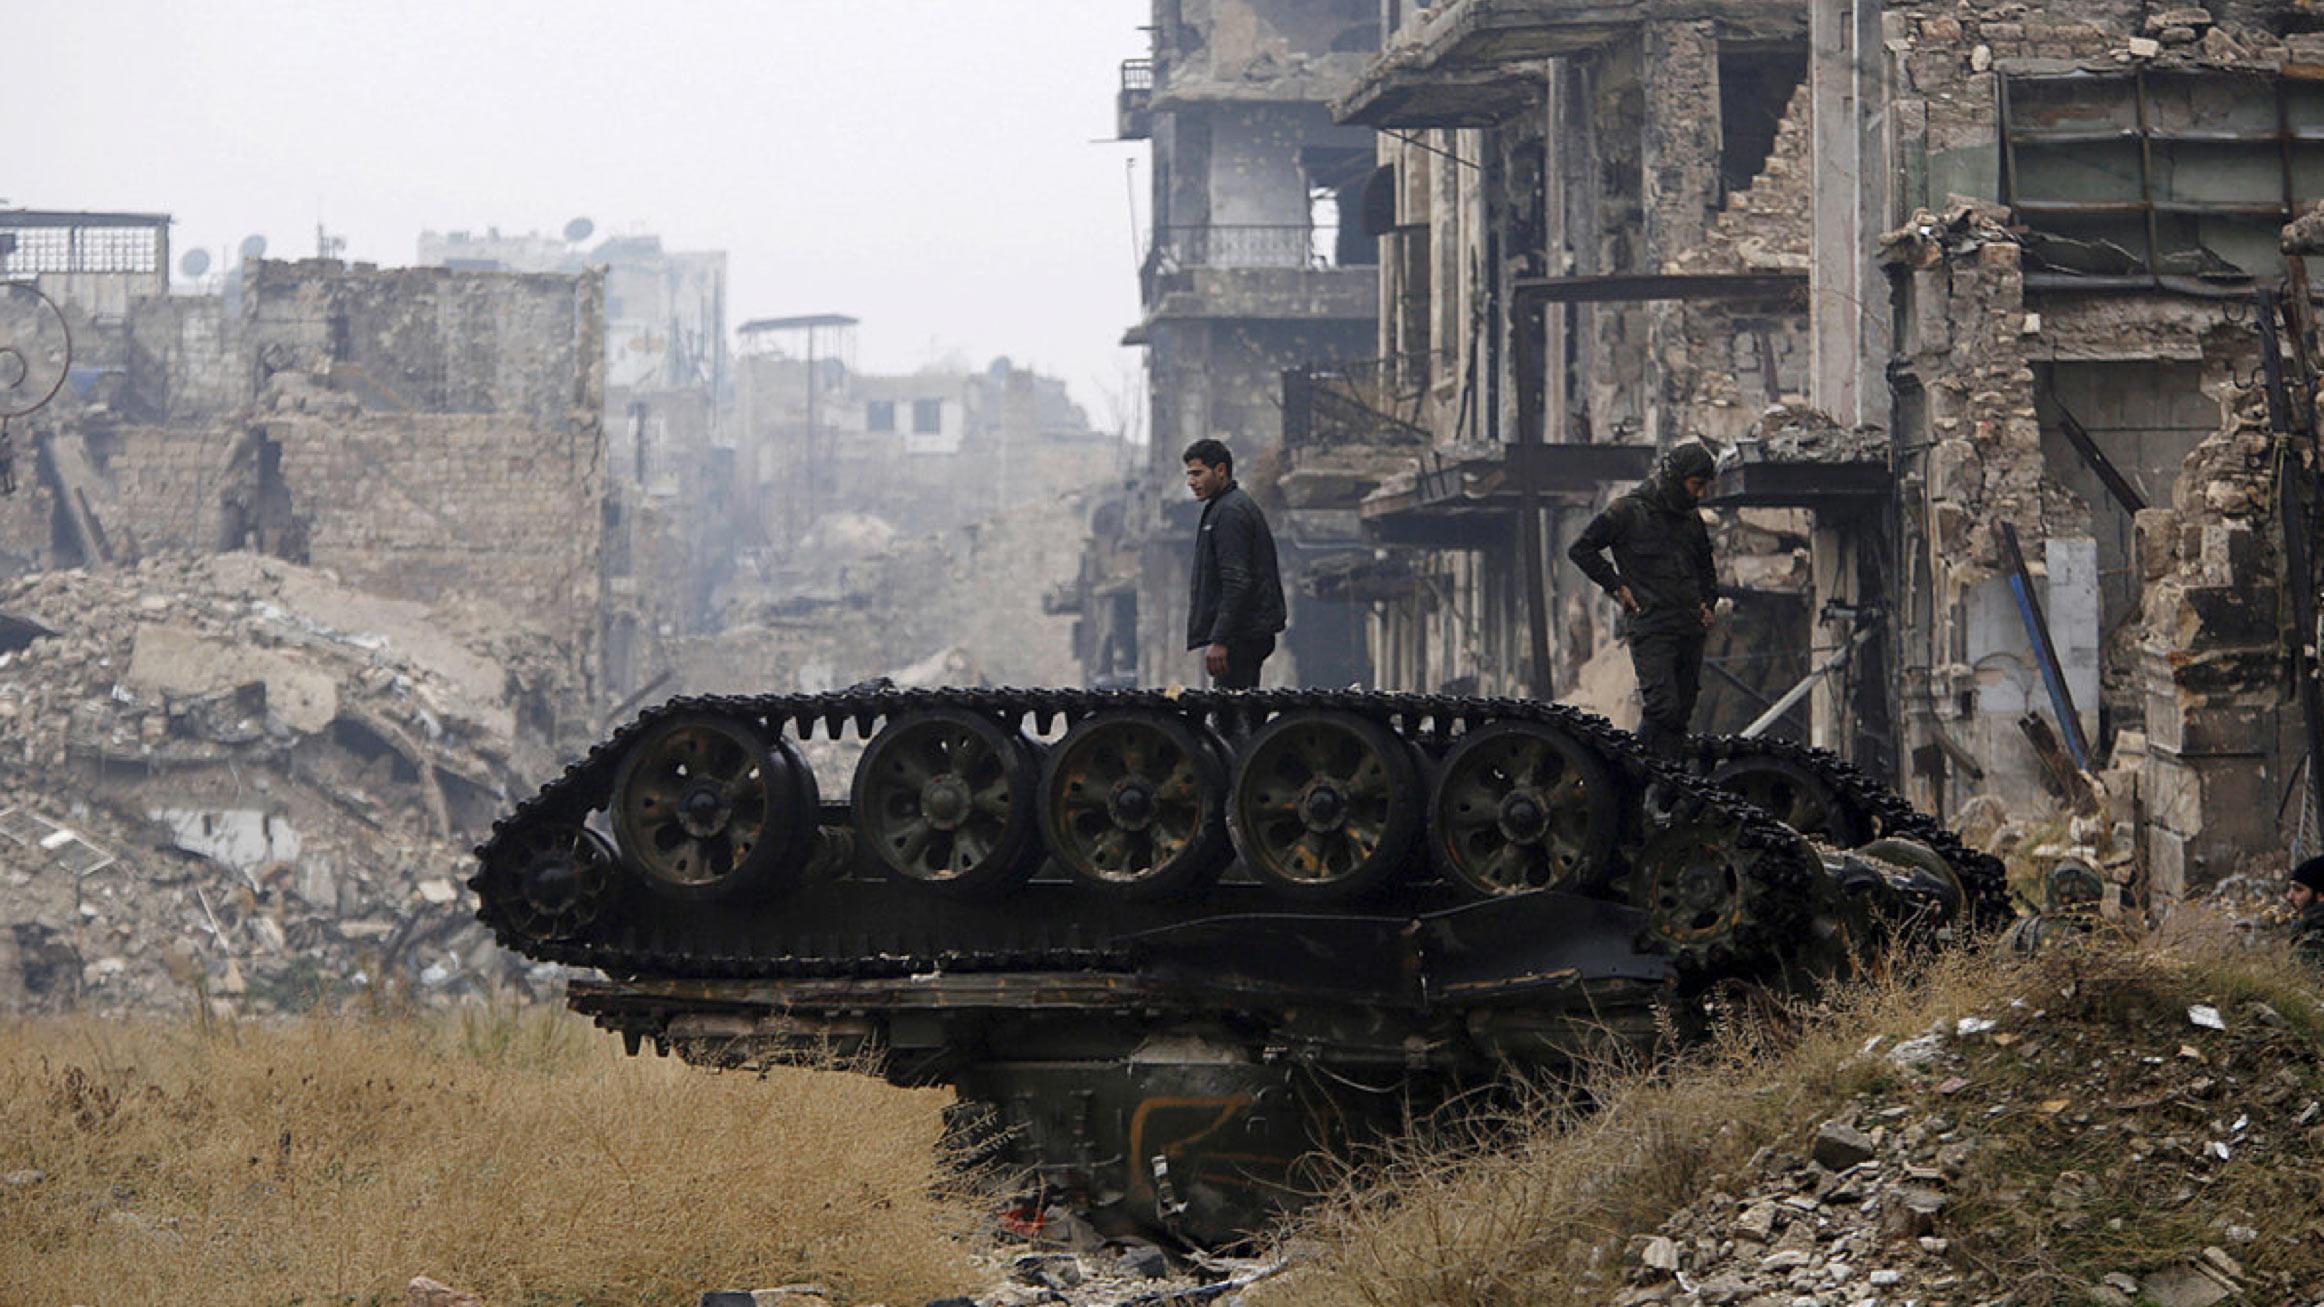 <p>Фото: &copy;&nbsp;REUTERS/Omar Sanadiki/File Photo</p>